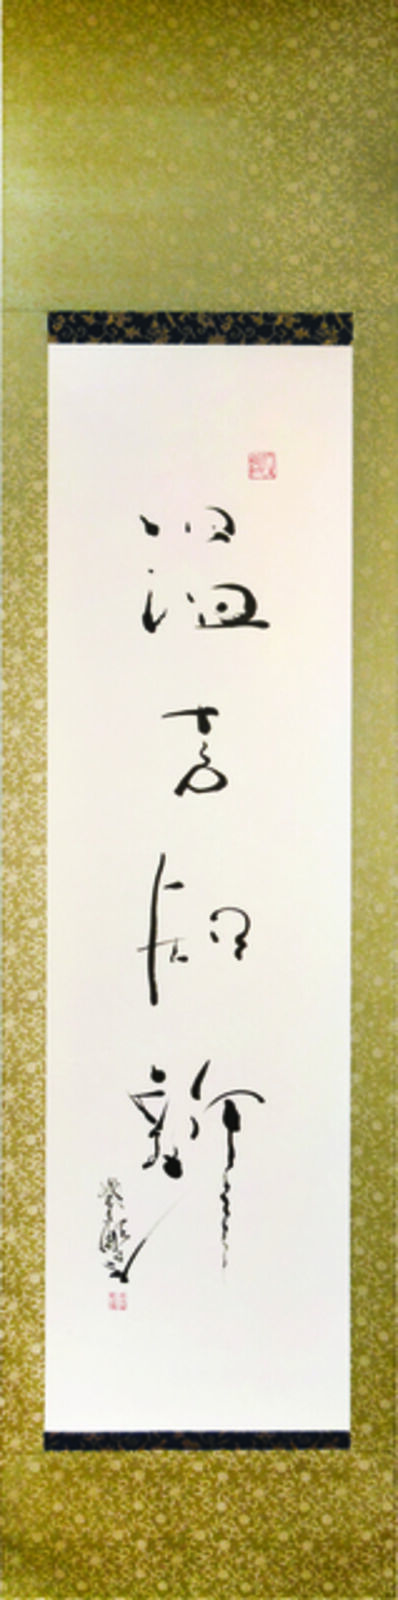 Horiyoshi III, 'Onkochishin--Learning from the Past', 2016